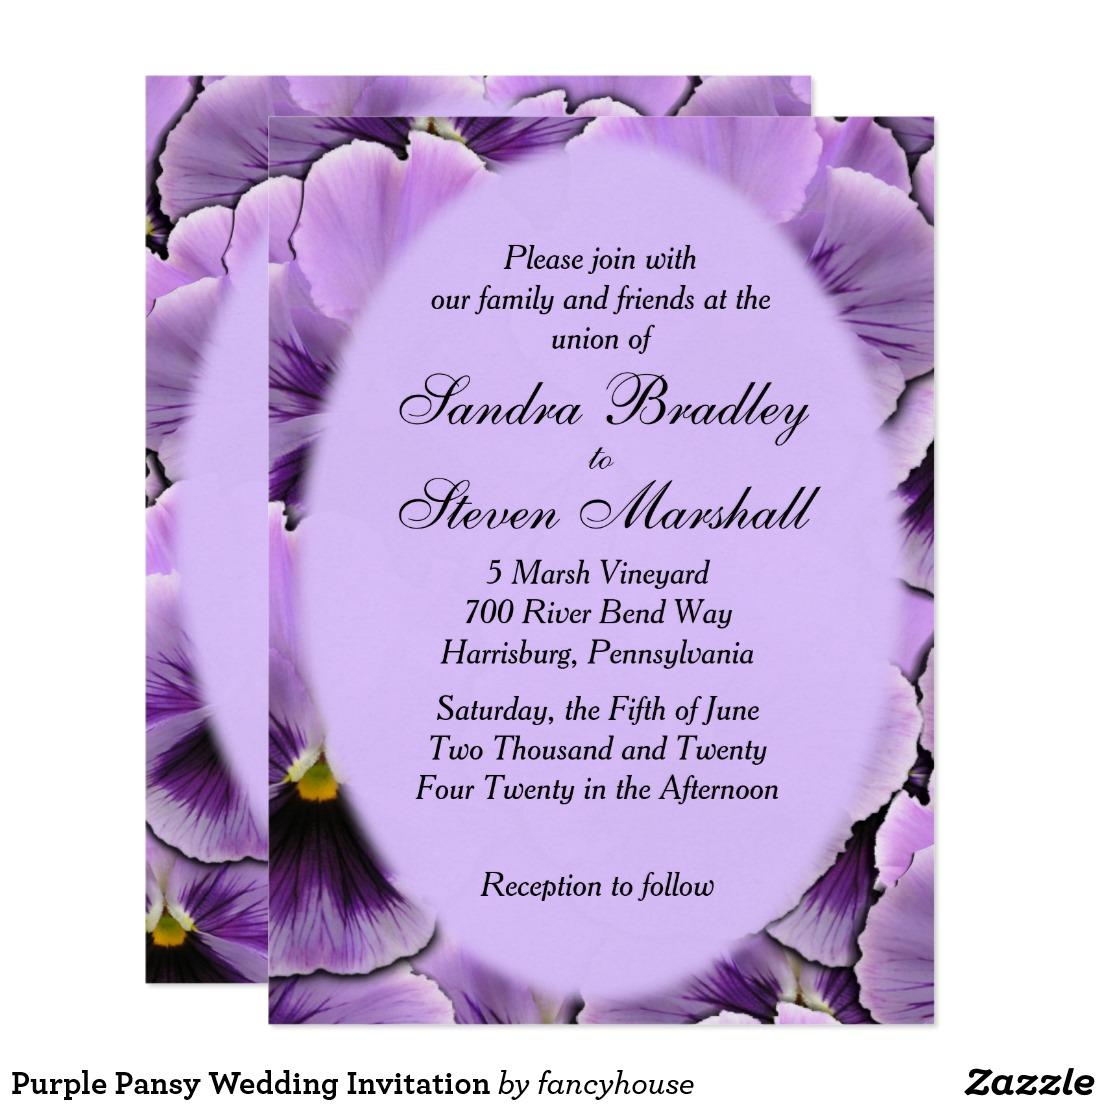 Purple Pansy Wedding Invitation